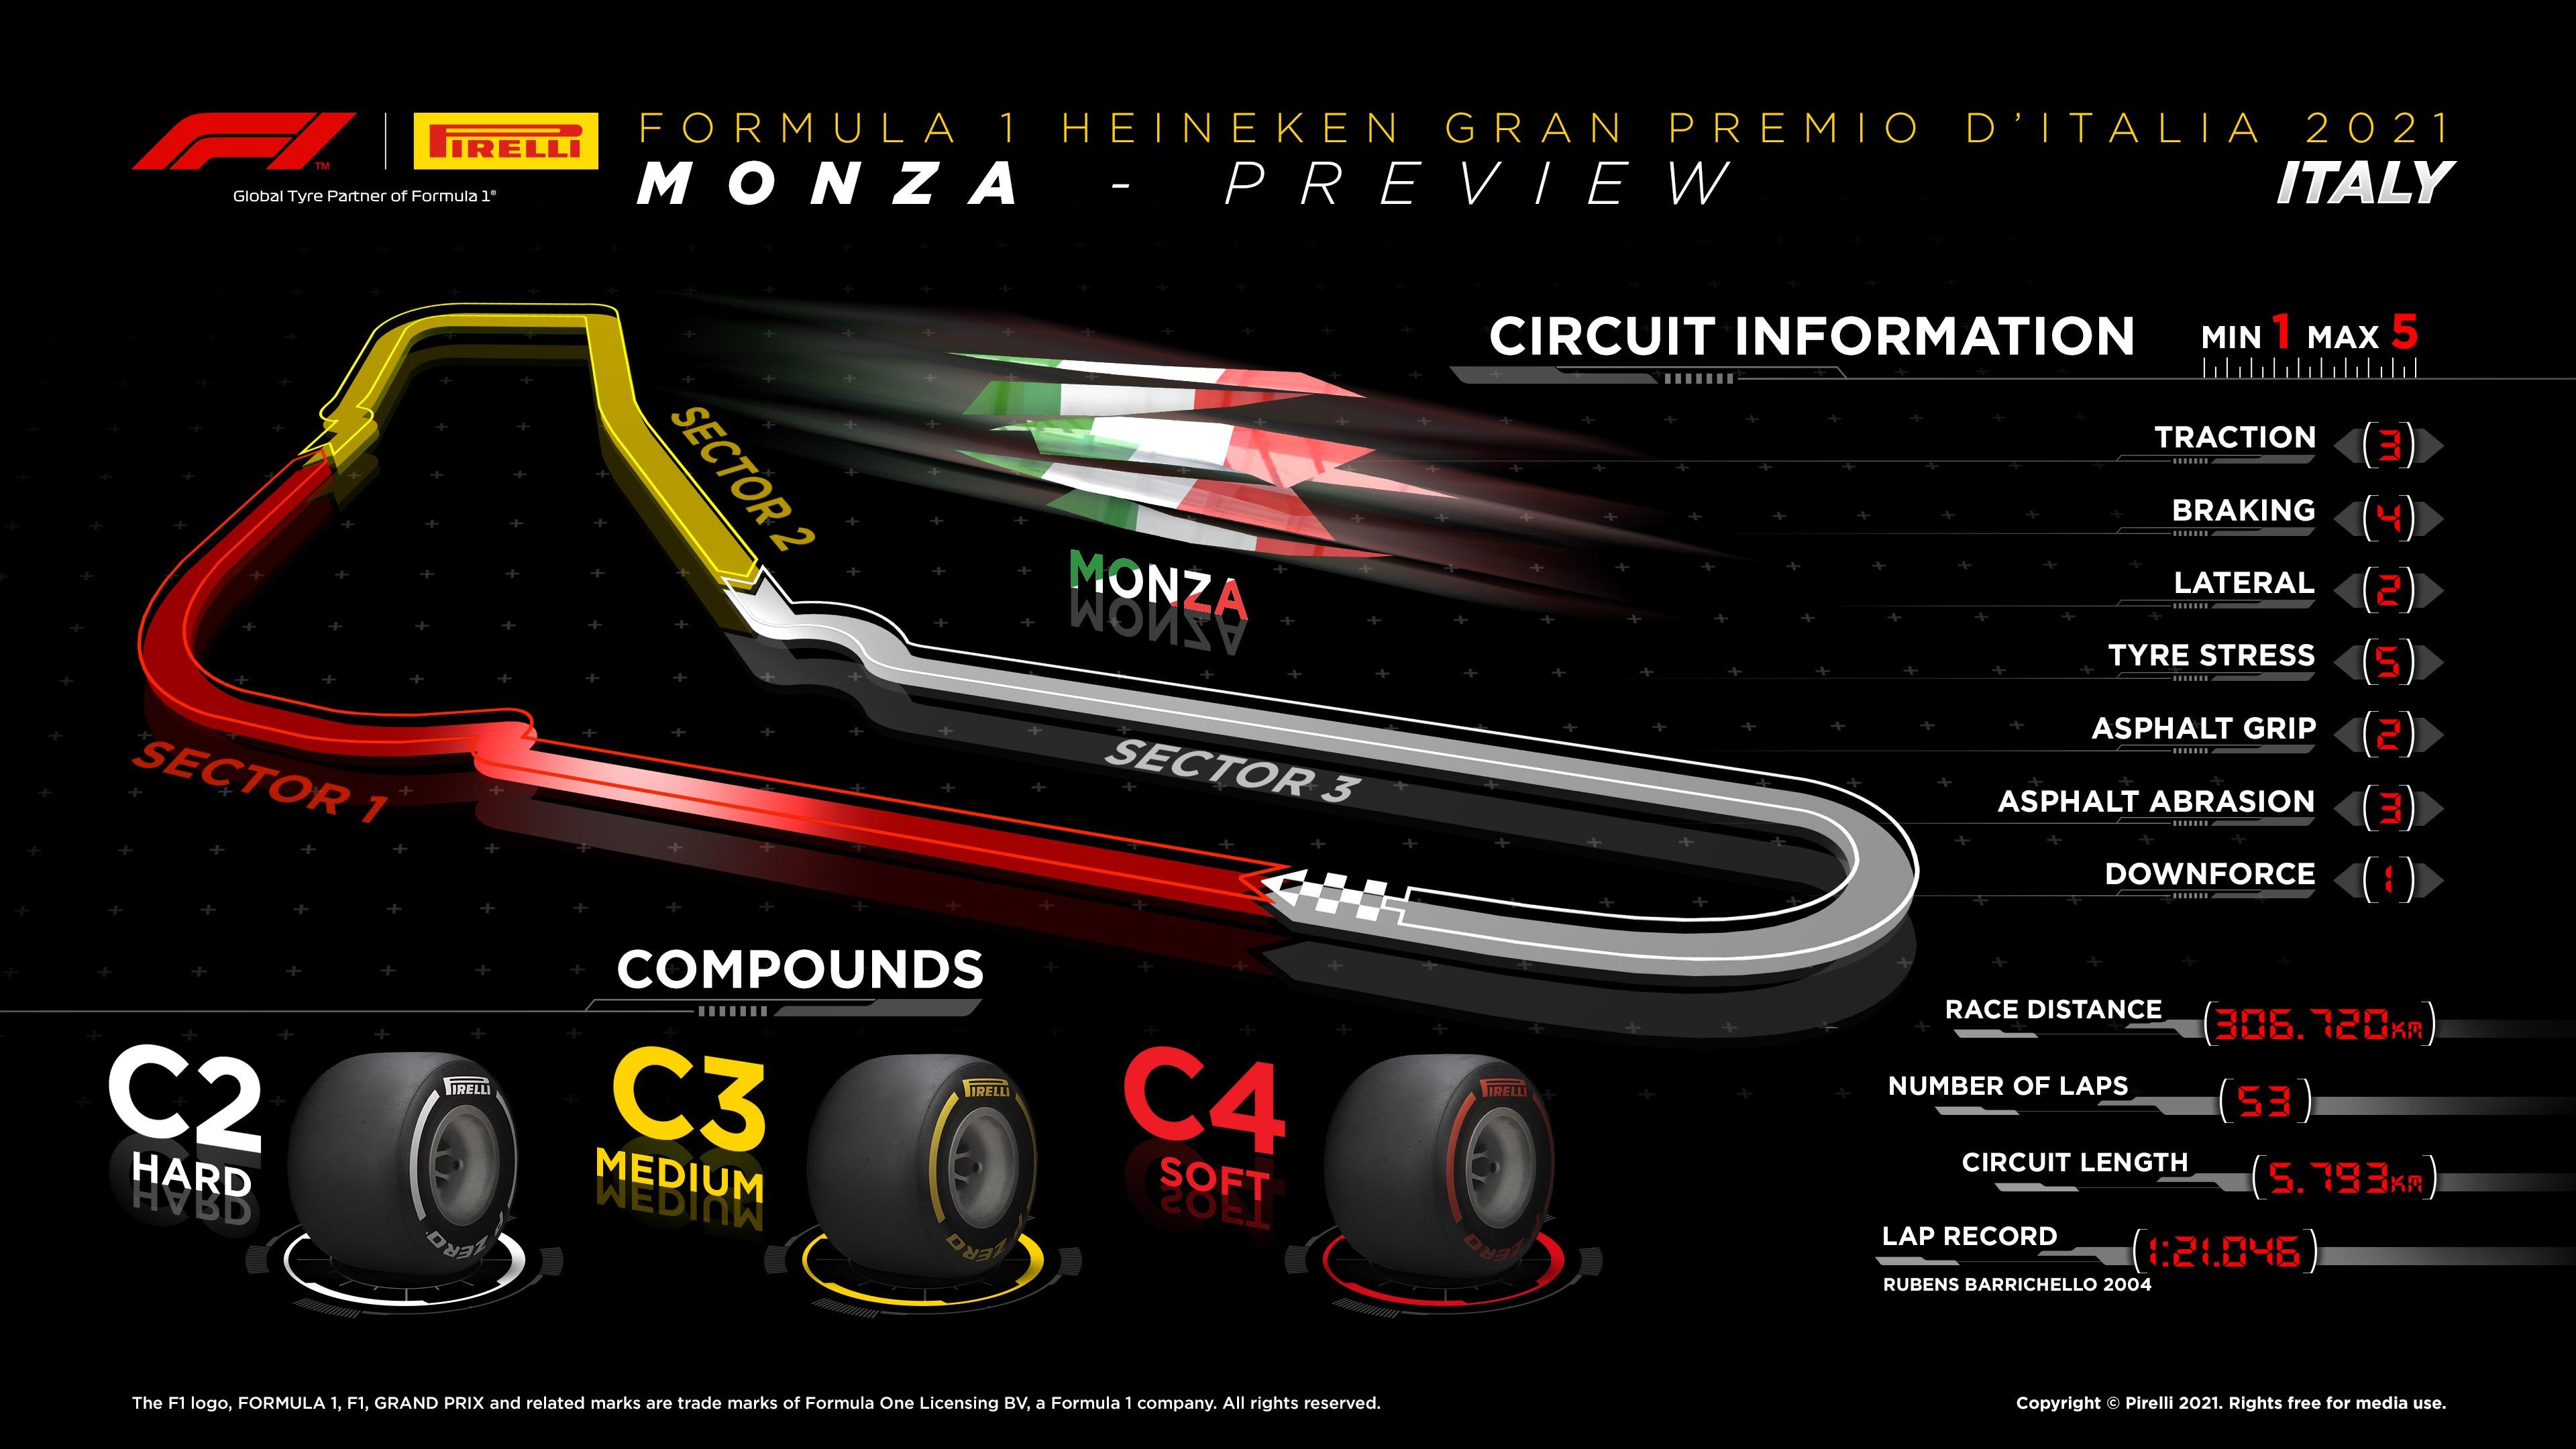 Infographic 2020 Italian F1 Grand Prix